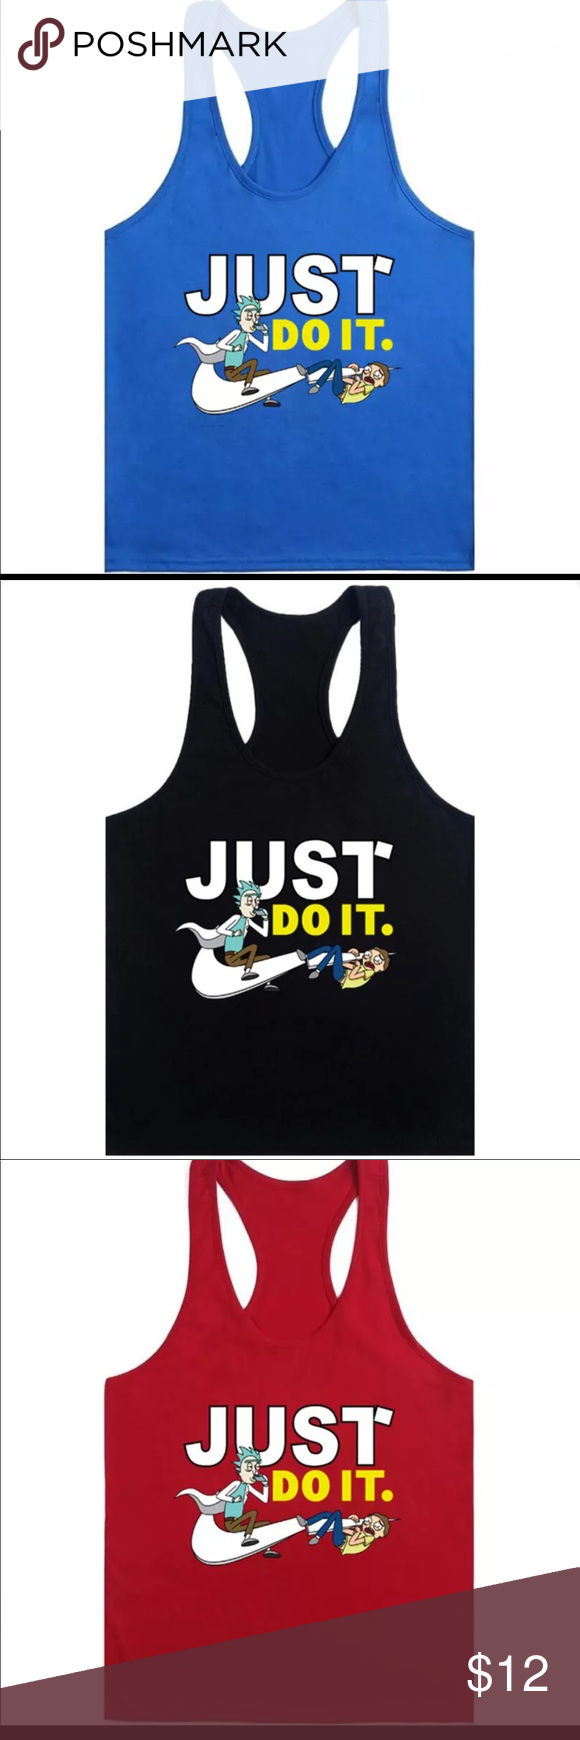 "e9f2b57fc67929 Rick and Morty ""Just Do It"" Nike Tank Top Rick and Morty Nike Just Do It  Tank Top 4 Colors Nike Shirts Tank Tops"